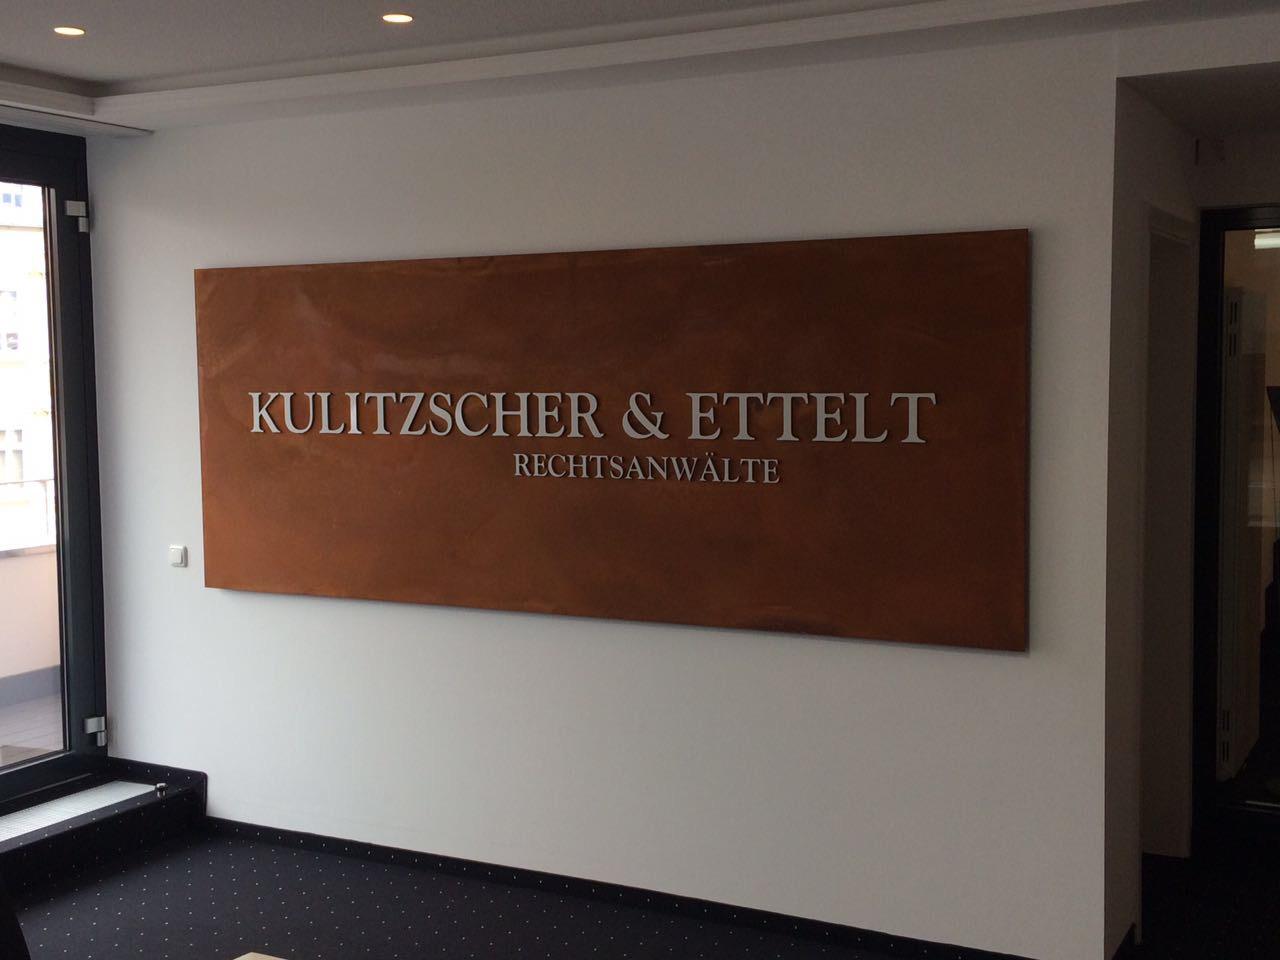 Kulitzscher & Ettelt